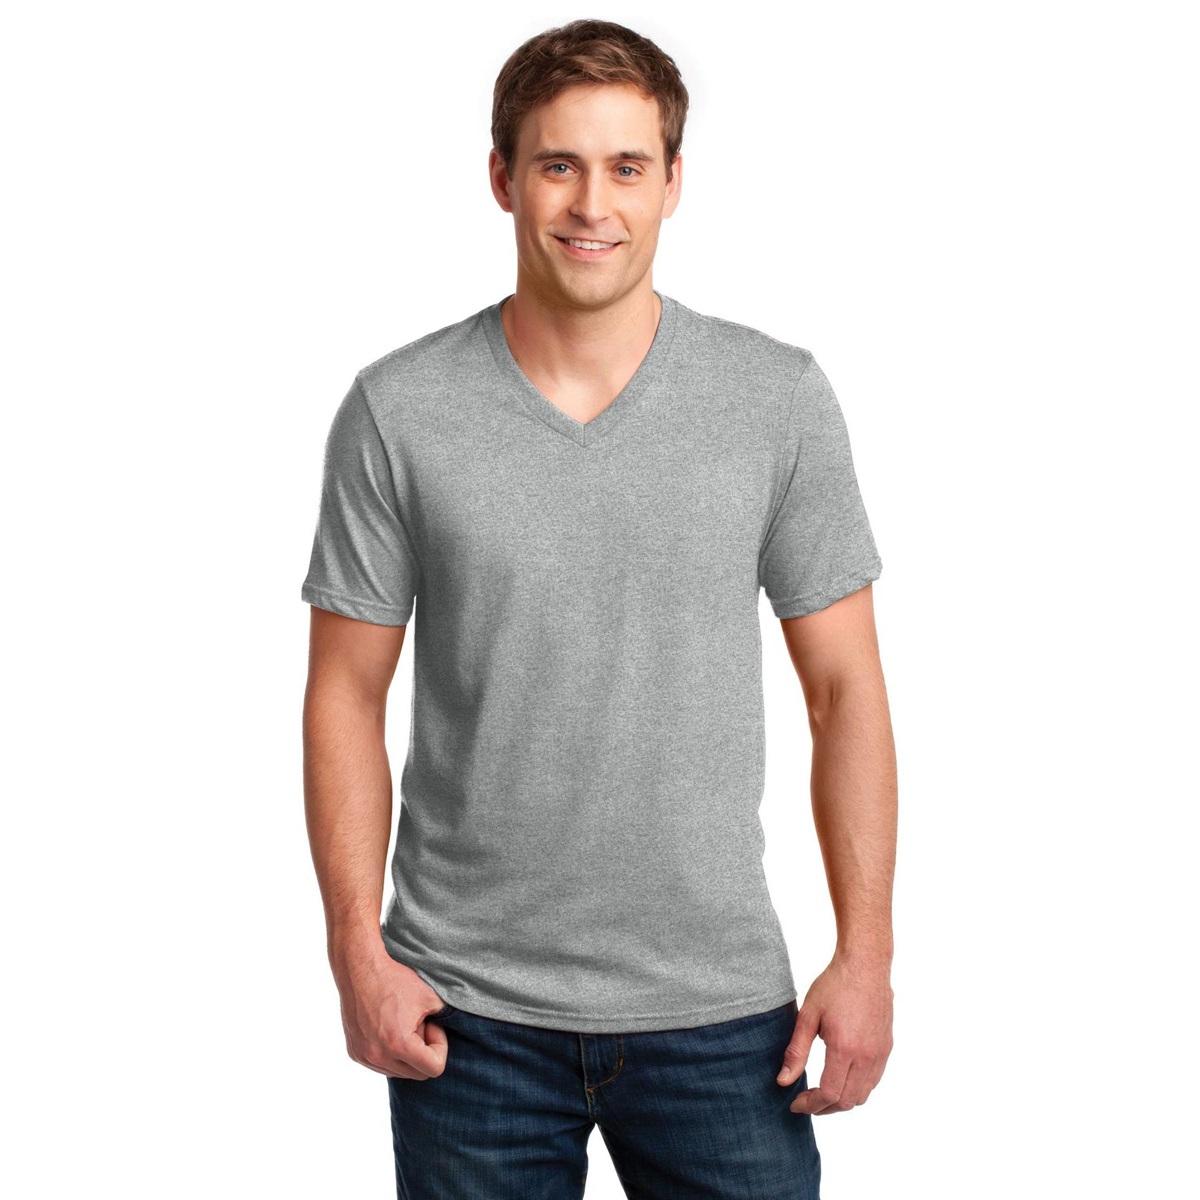 Anvil 982 Ring Spun Cotton V Neck T Shirt Heather Grey